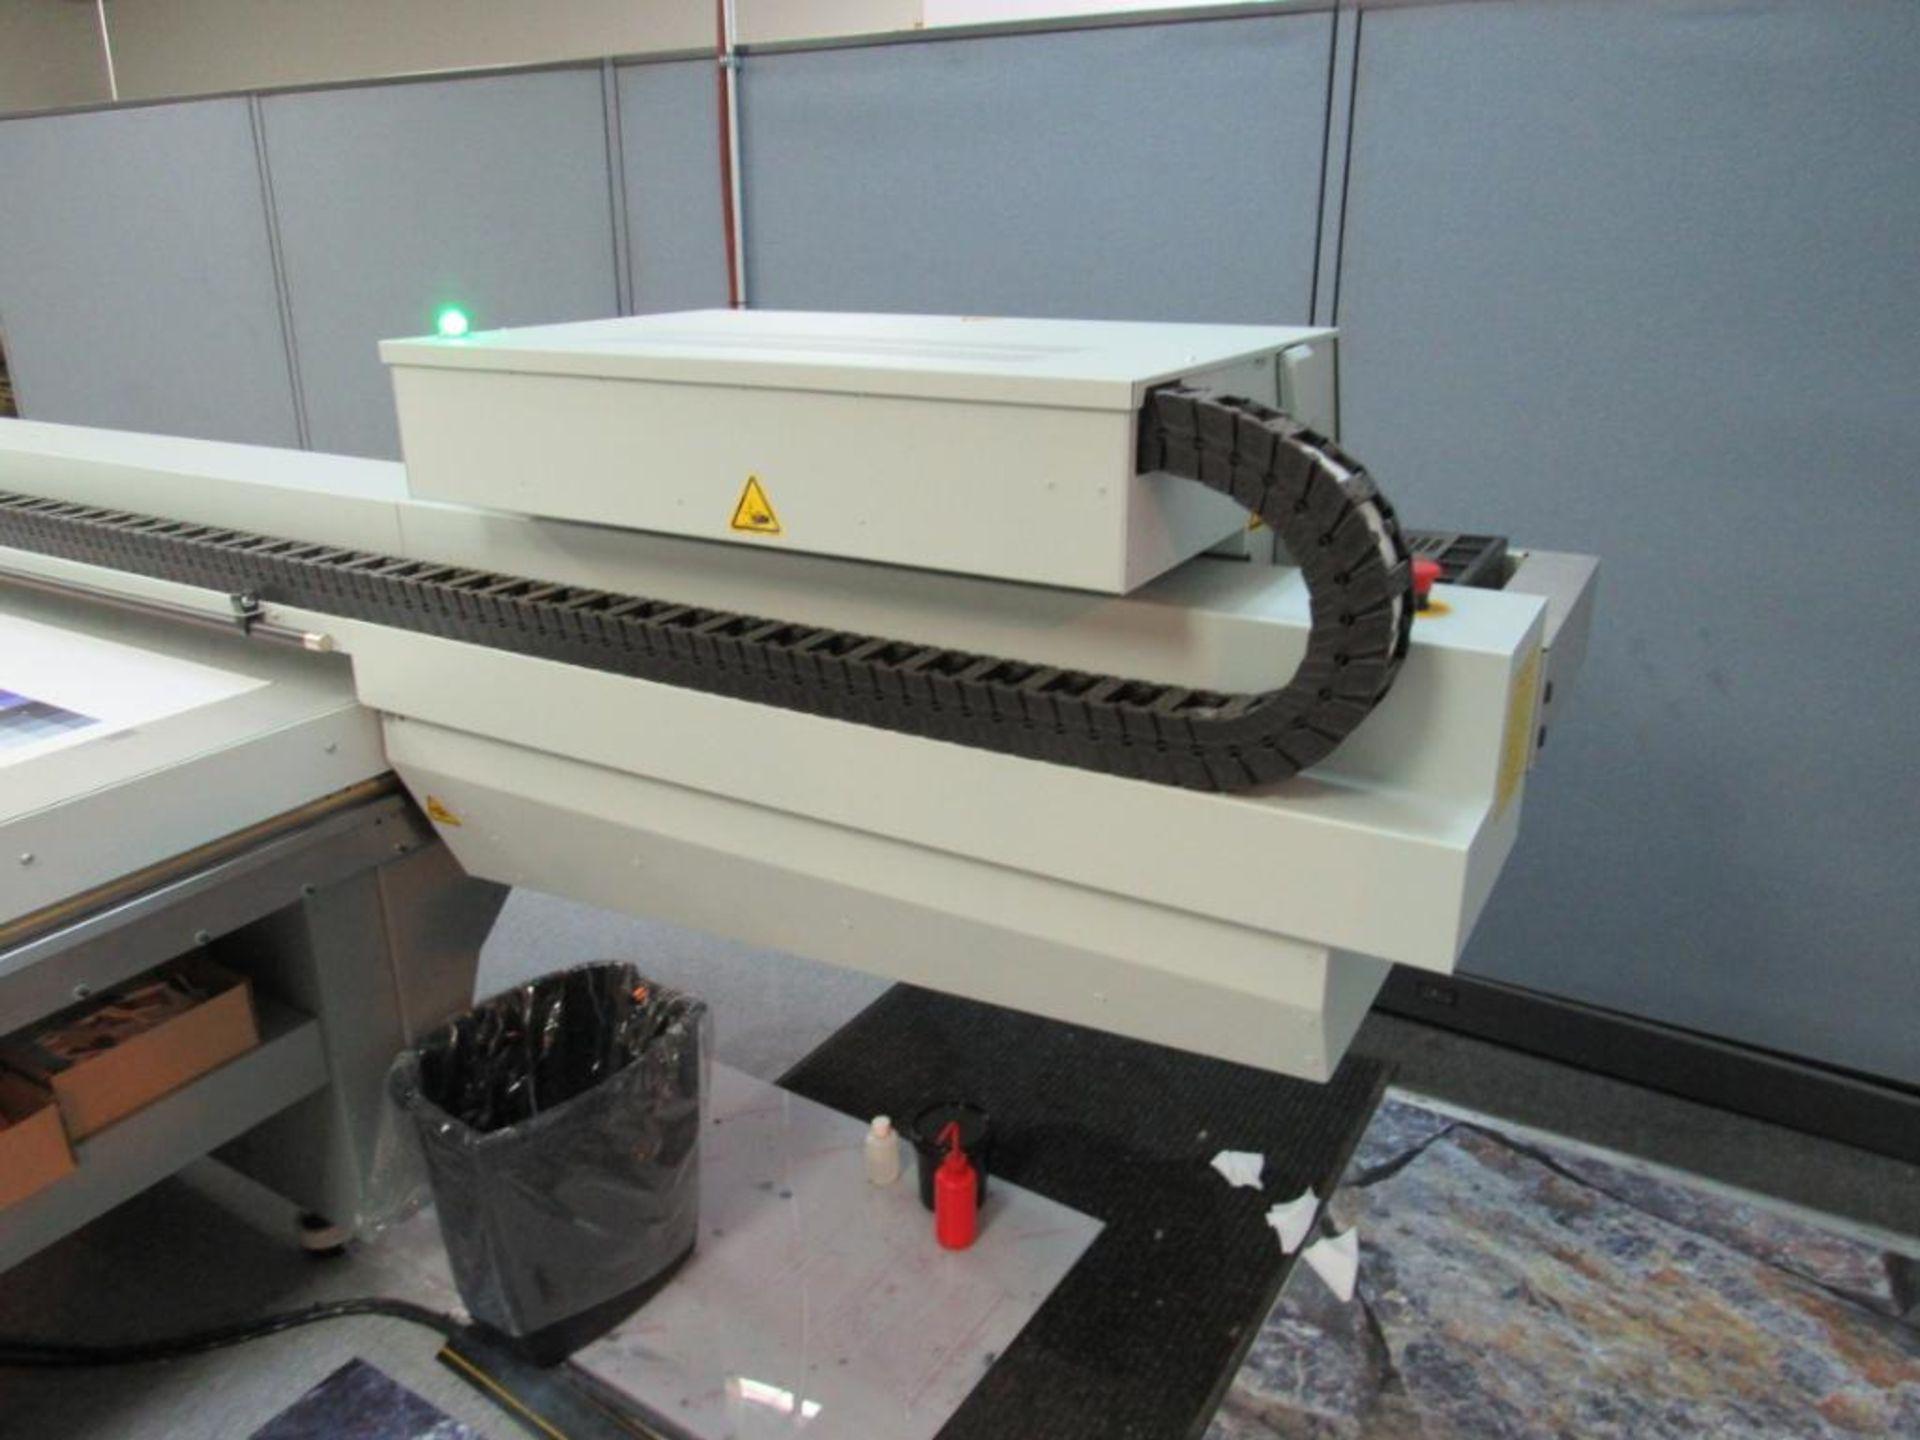 2018 OCE Arizona 2260 GT, High Volume UV Flatbed Printer, 6-Ink Channels, 49 in. x 98.4 in. Rigid - Image 4 of 6